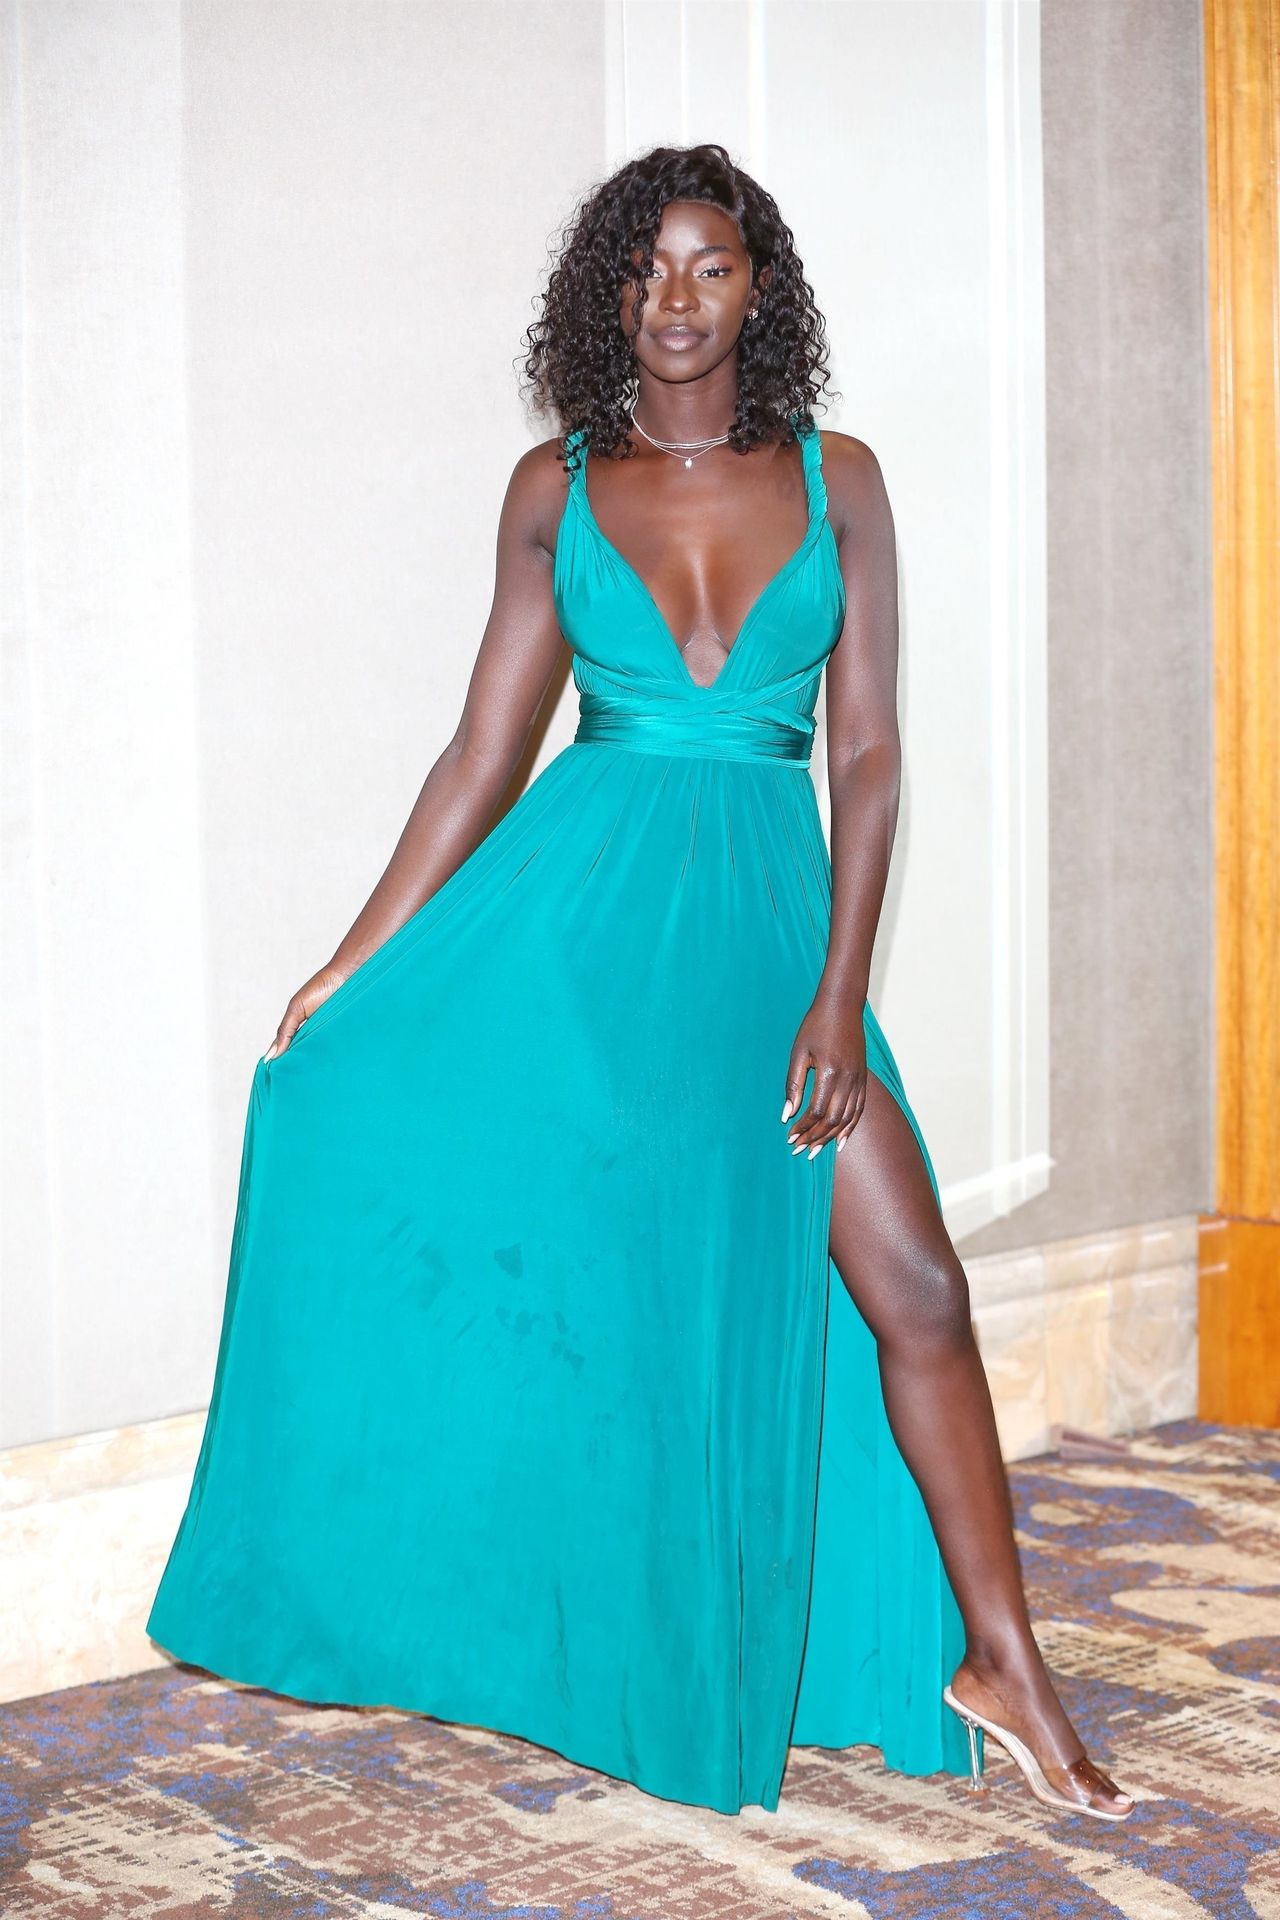 Mike Boateng & Priscilla Anyabu Are Seen At British Ethnic Diversity Sports Awards 0146